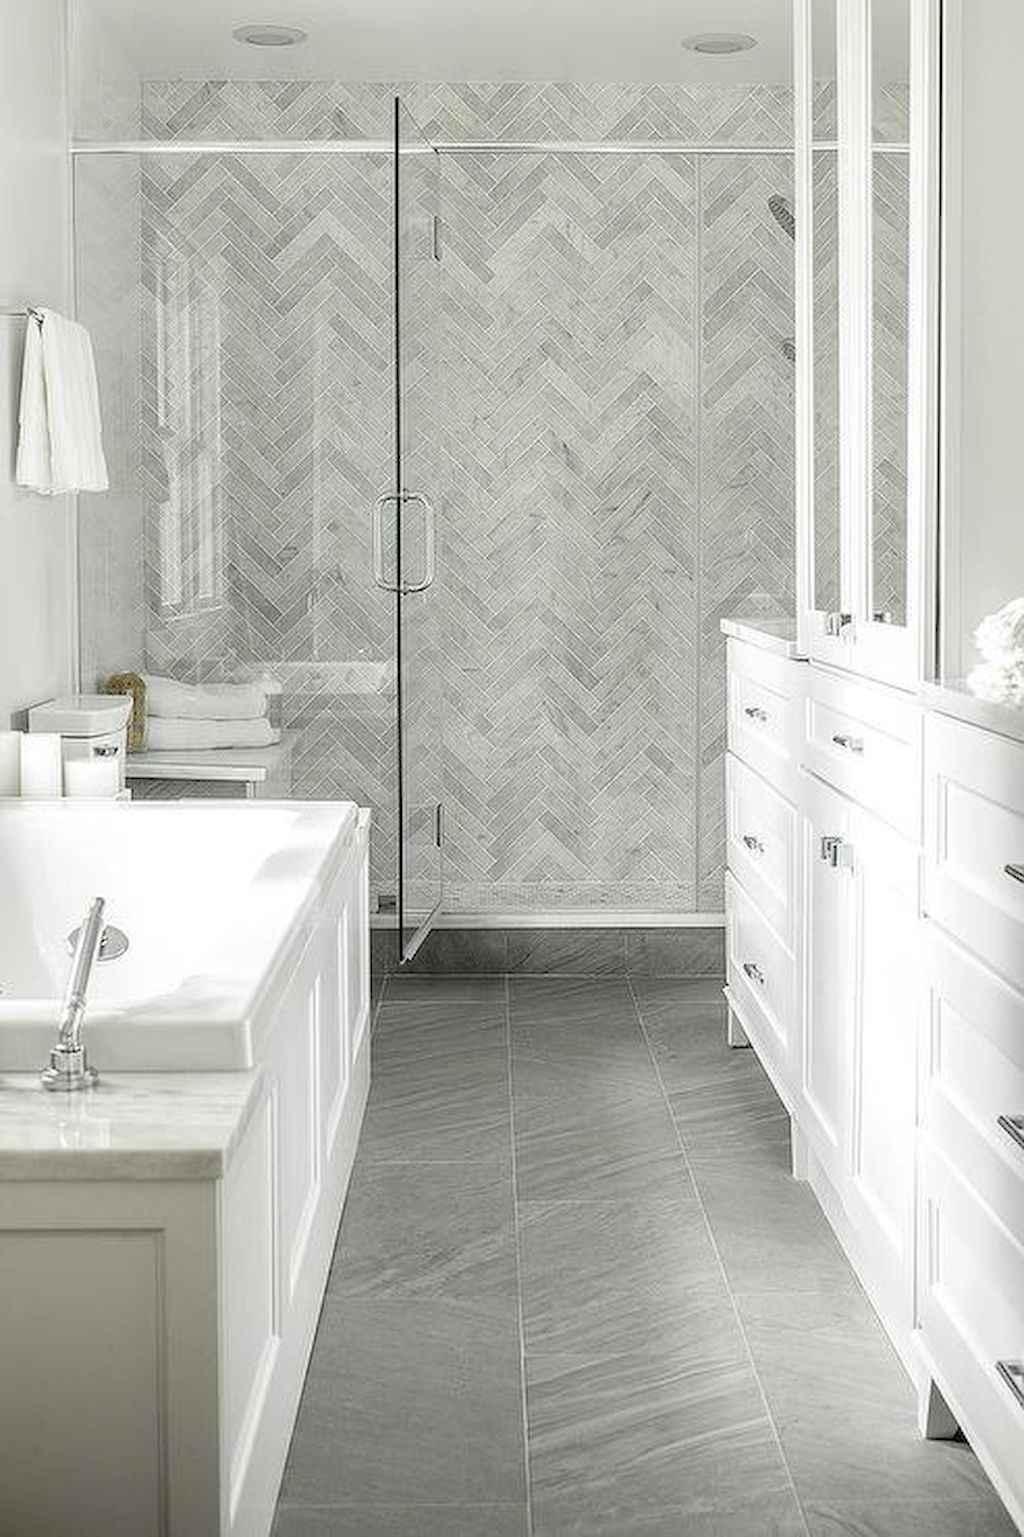 50 beautiful bathroom shower tile ideas (40) - Roomadness.com